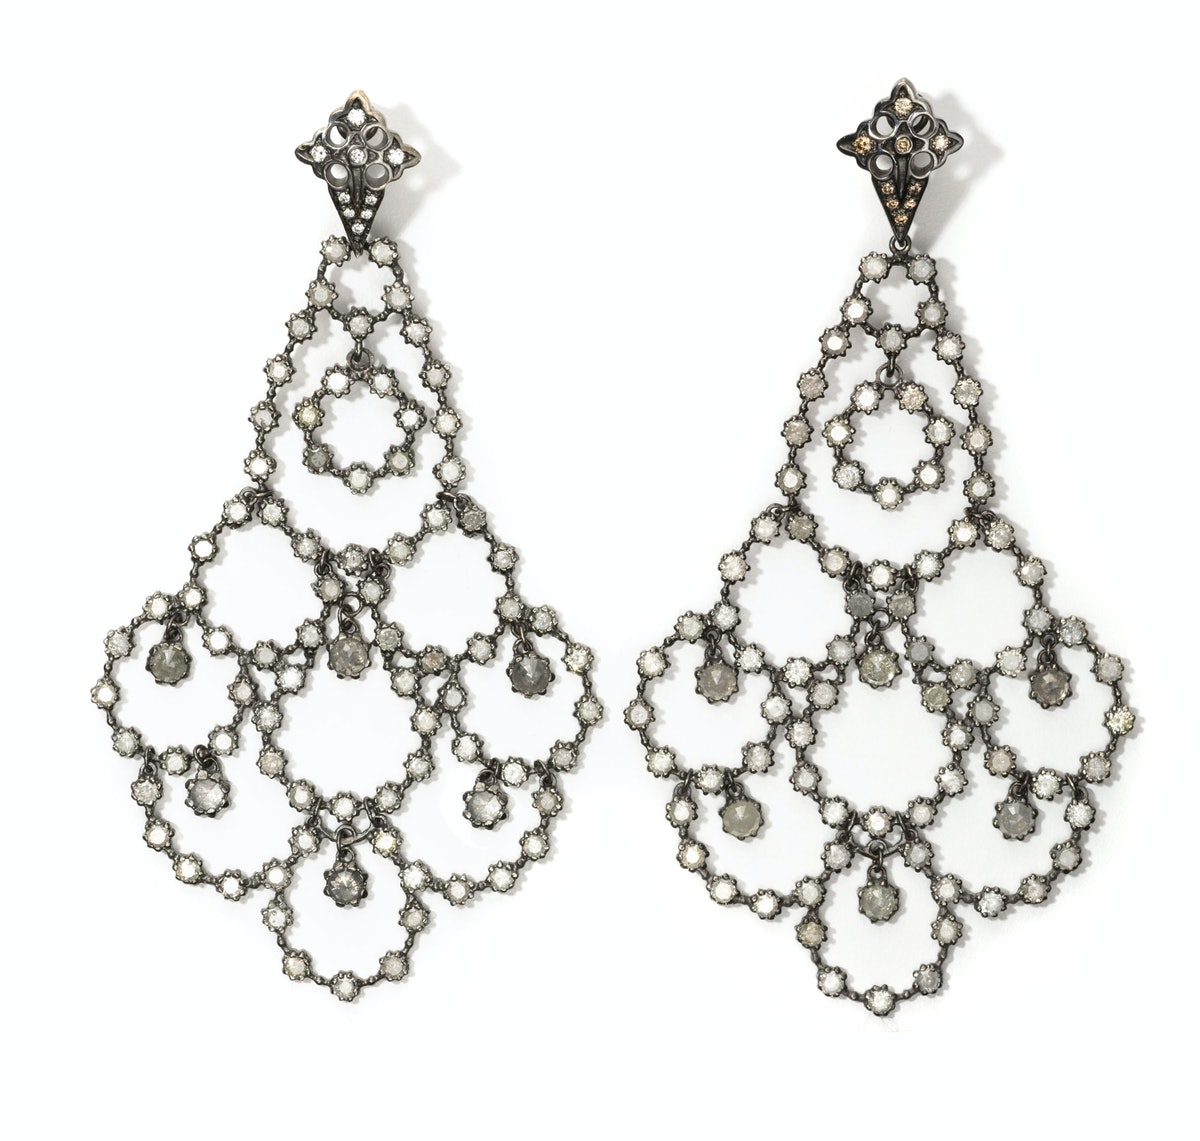 Loree Rodkin gold, rhodium, and diamond earrings, $38,375, Bergdorf Goodman, New York.